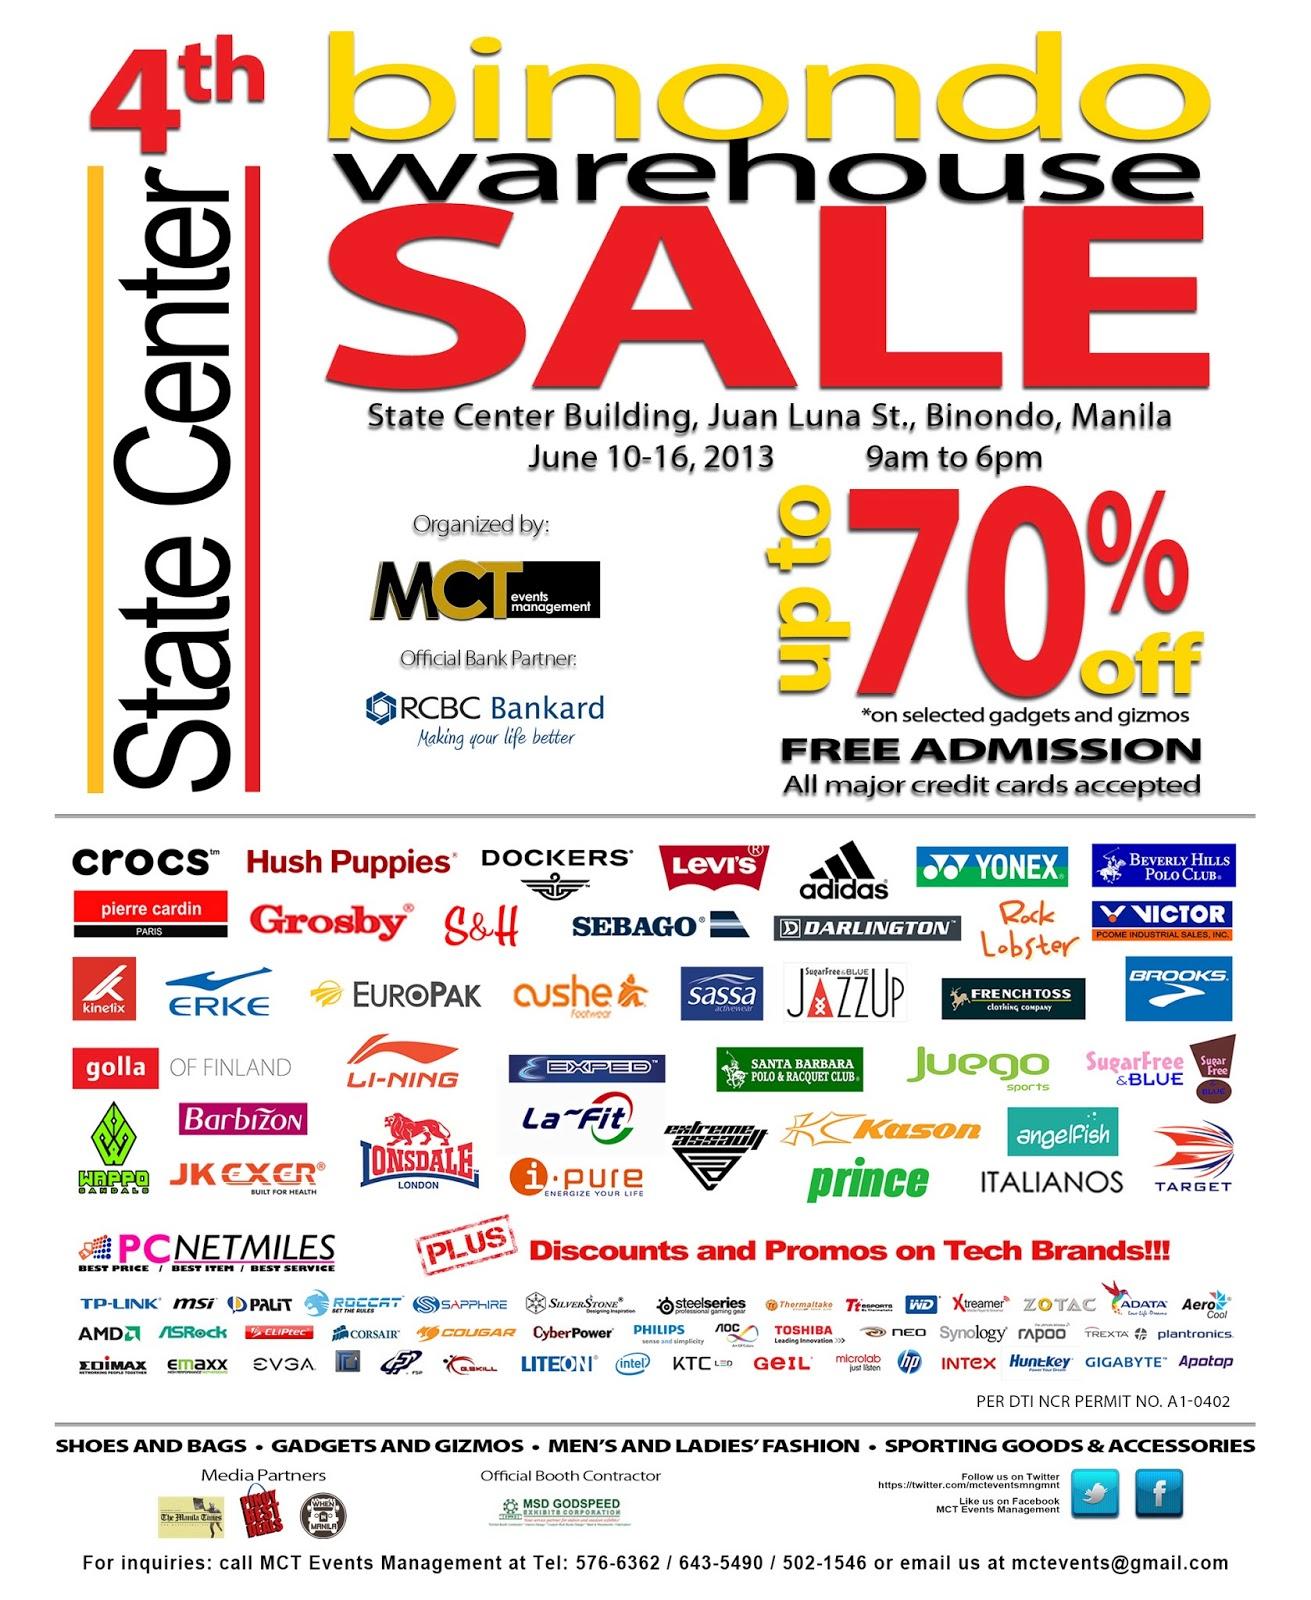 233d429c4a00 Gelleesh  SALE ALERT  4th Binondo Warehouse Sale